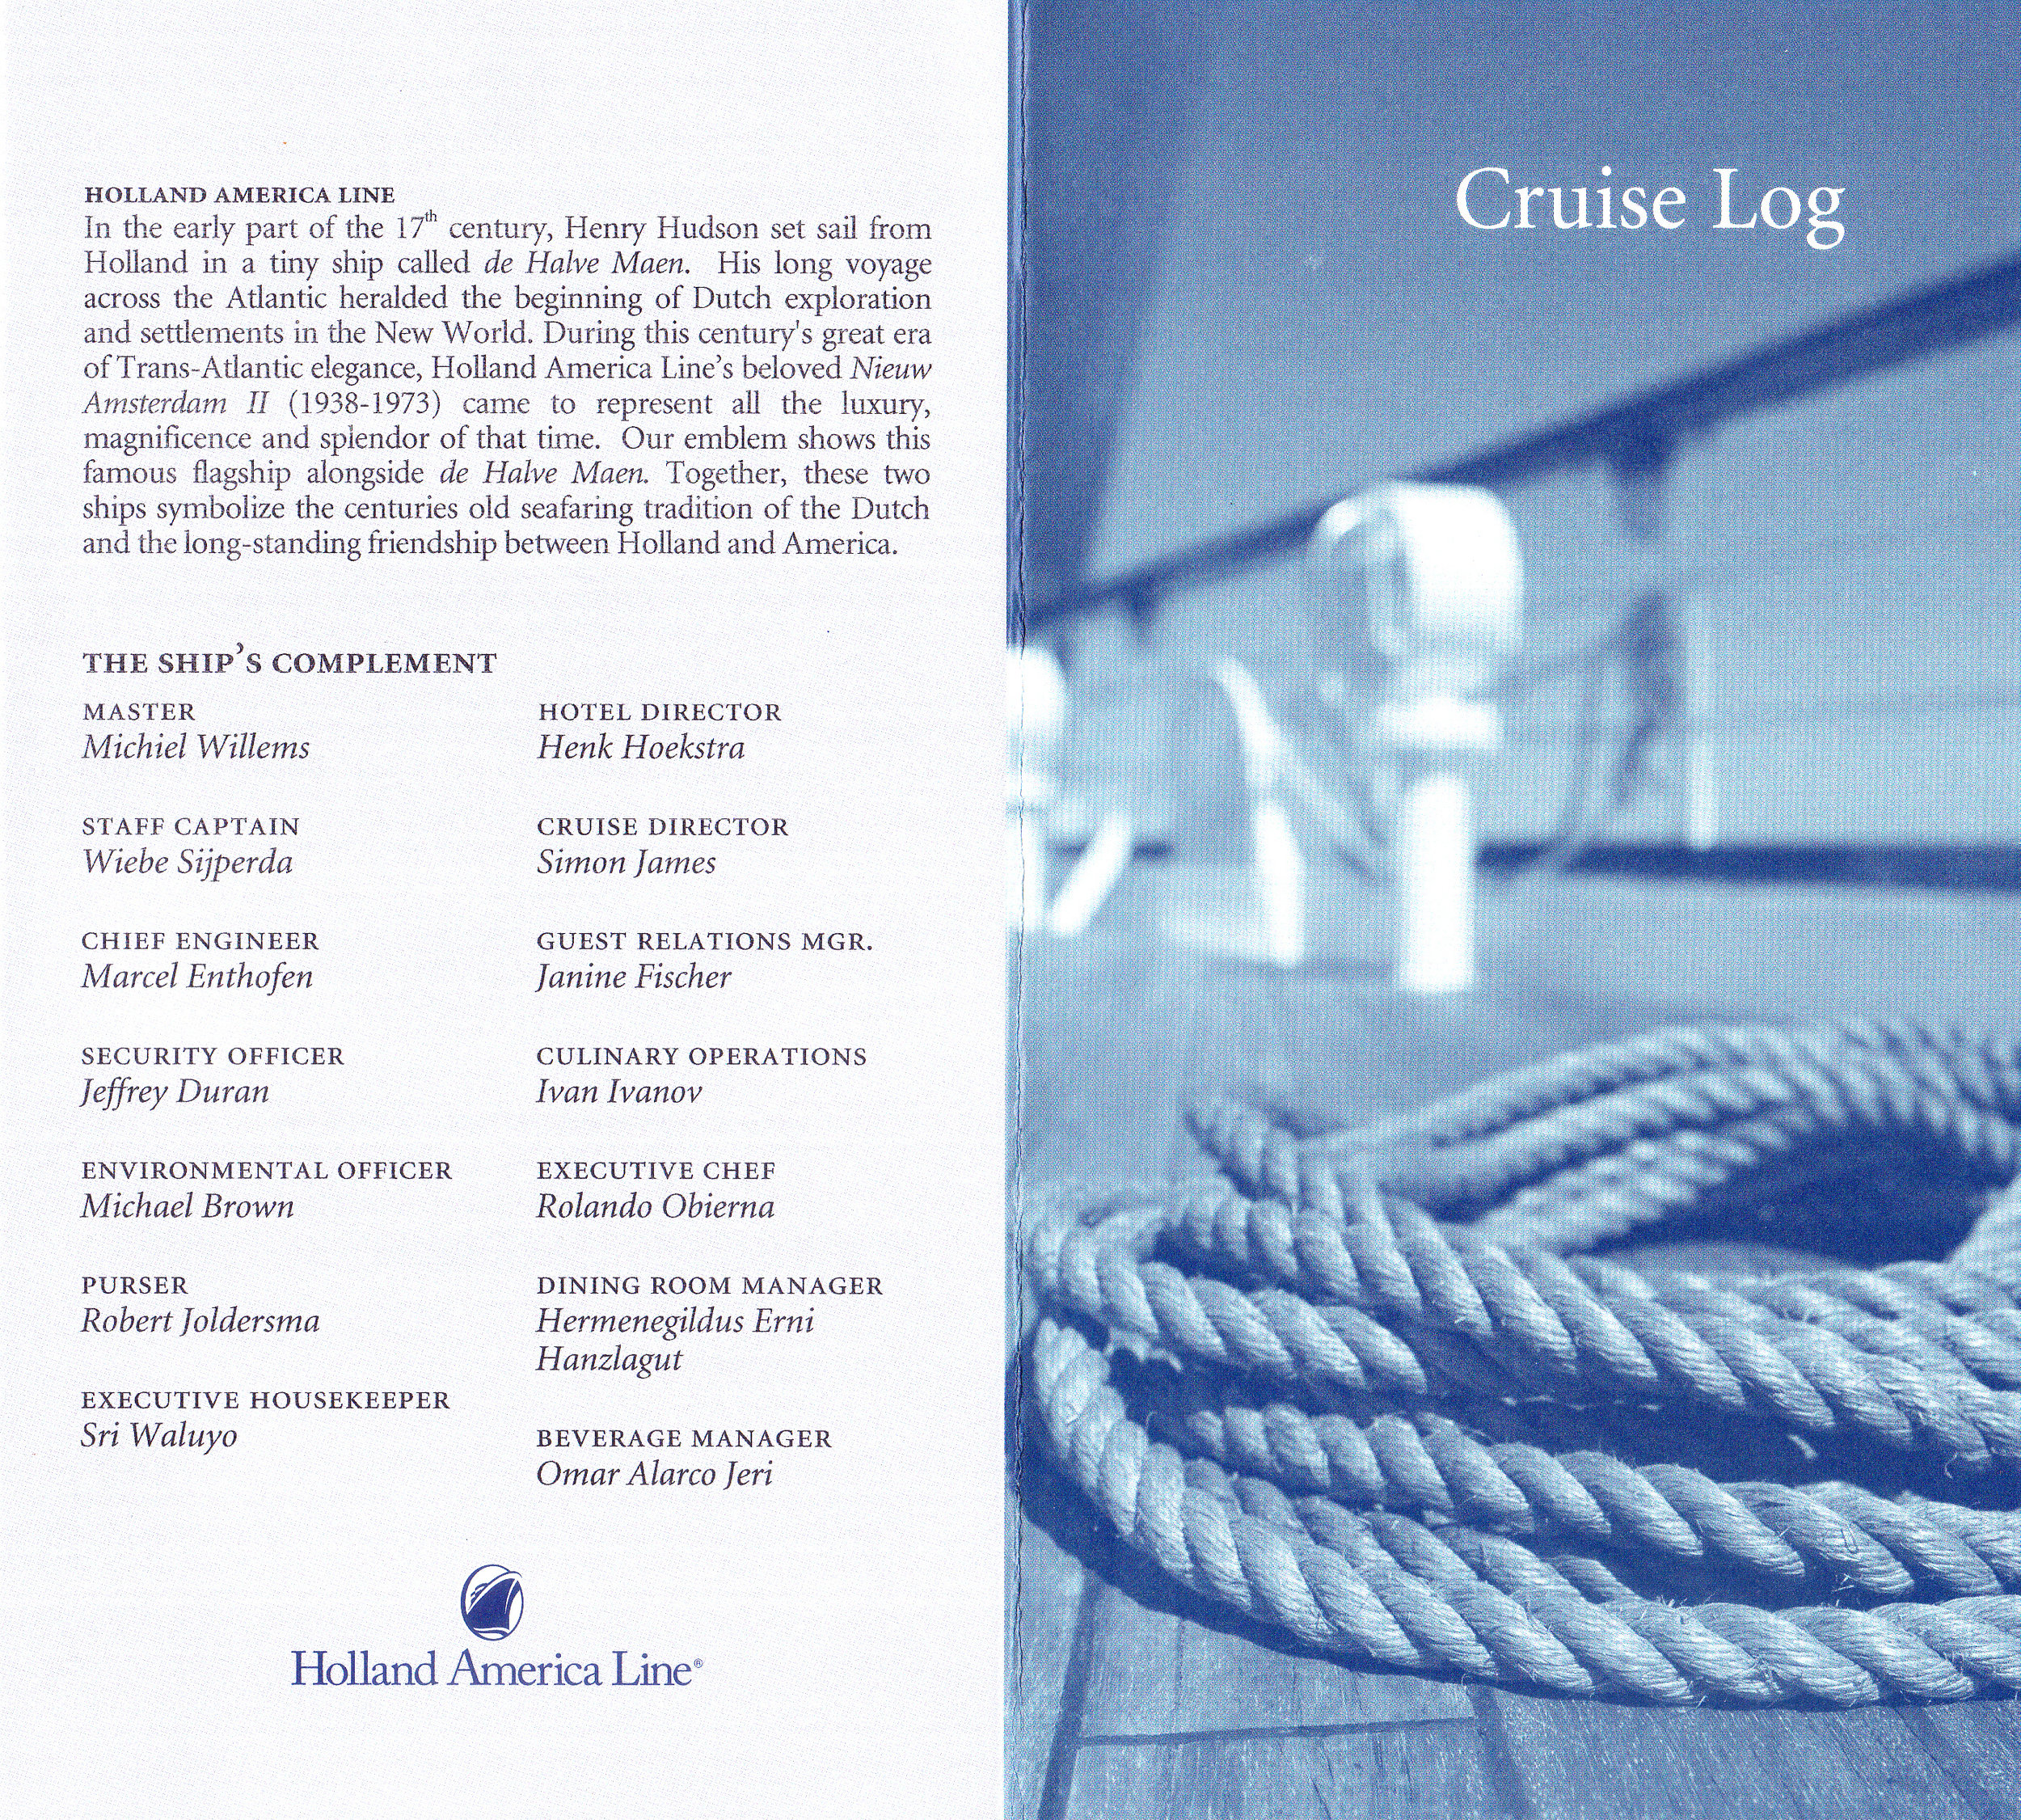 Cruise Log